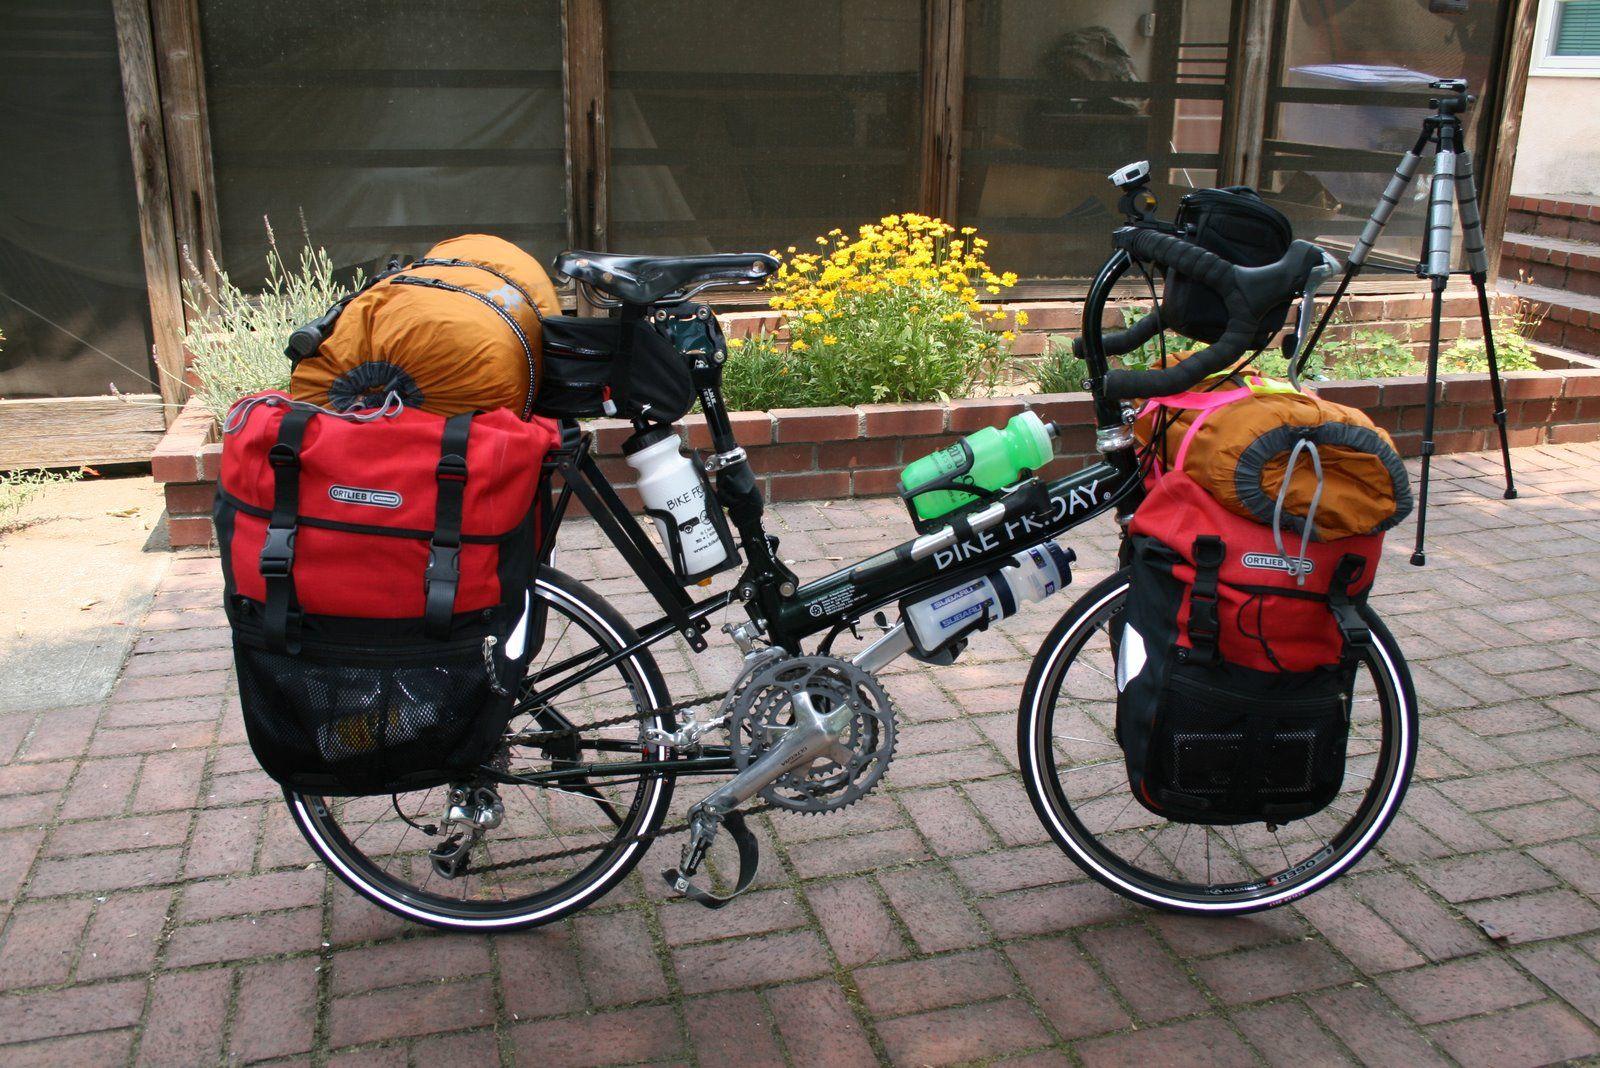 Pin By B M On Bicycling Bike Friday Bike Camping Touring Bike